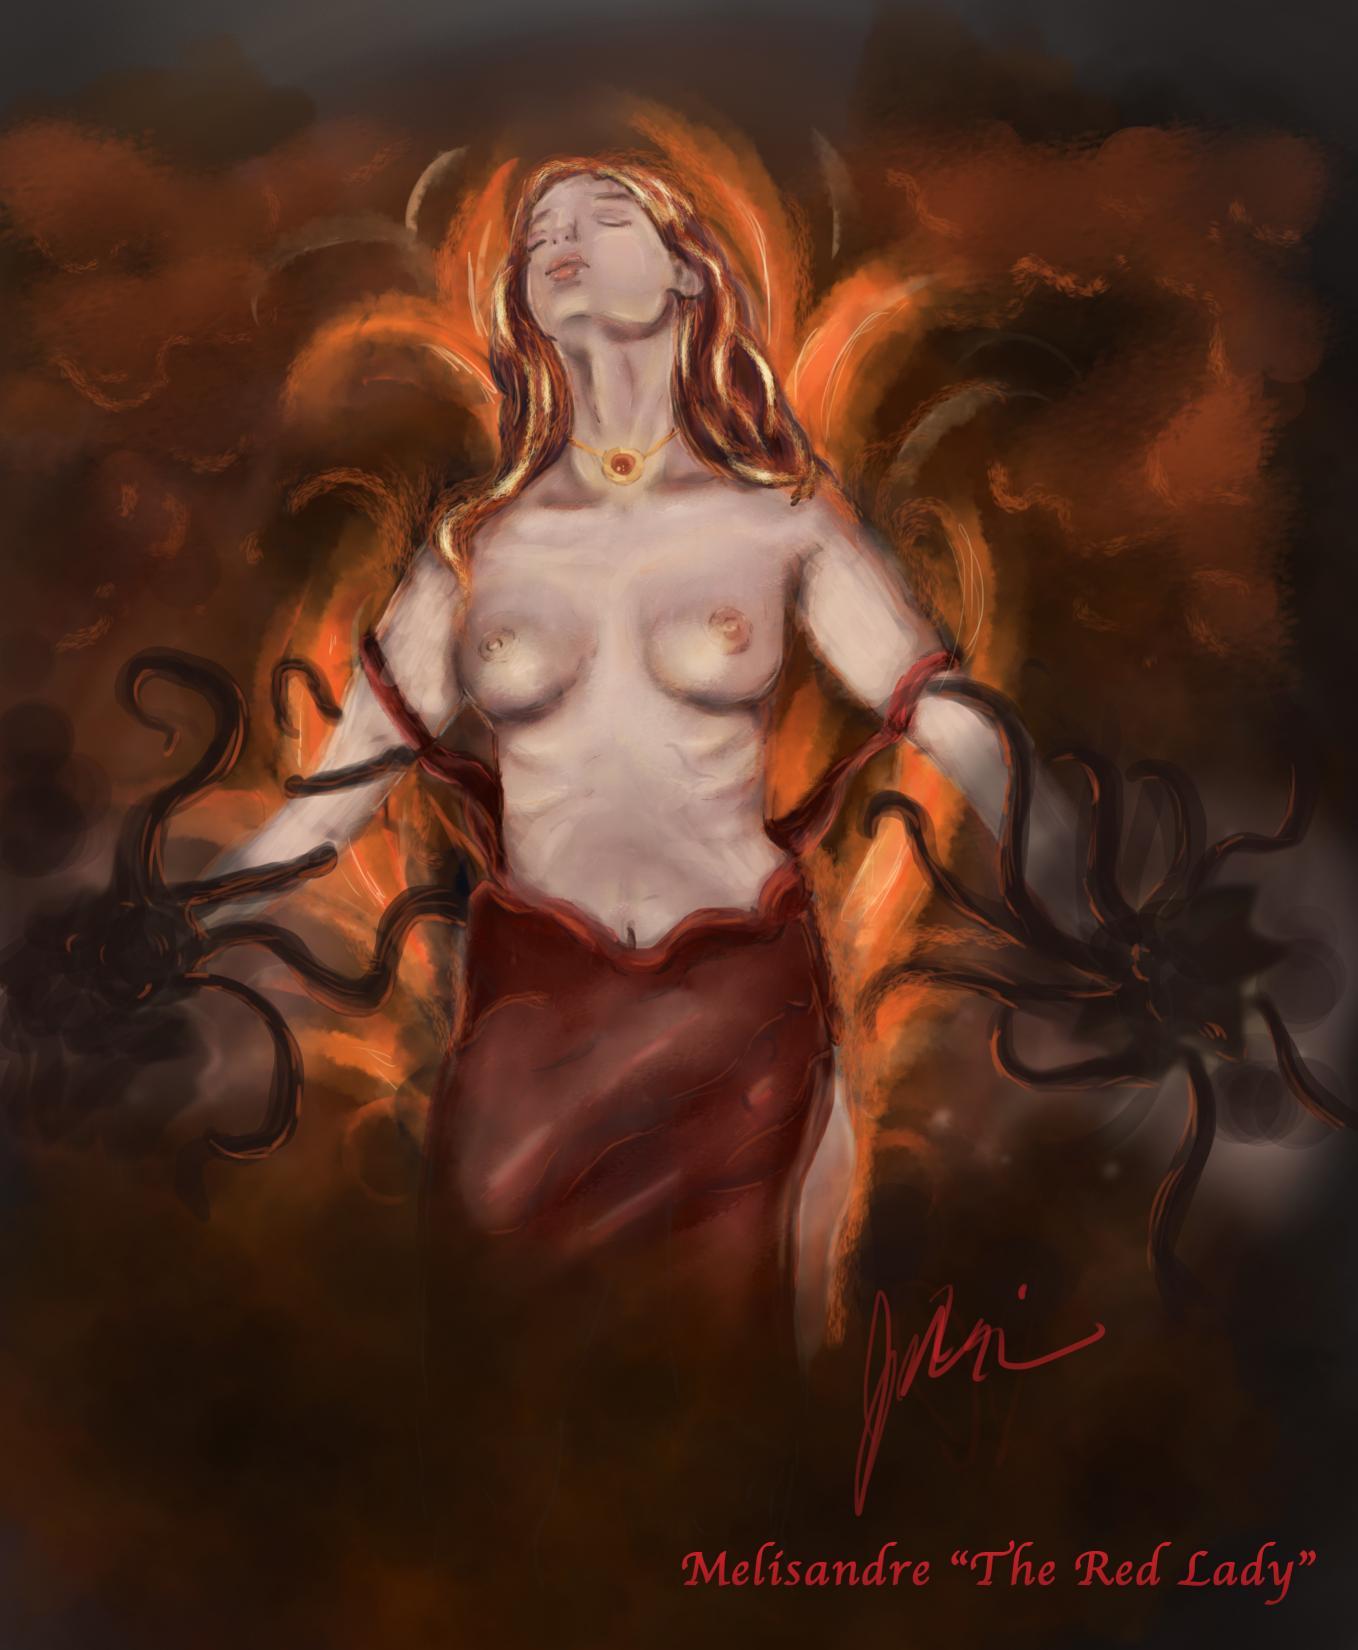 thrones art of game erotic Spitter from left 4 dead 2